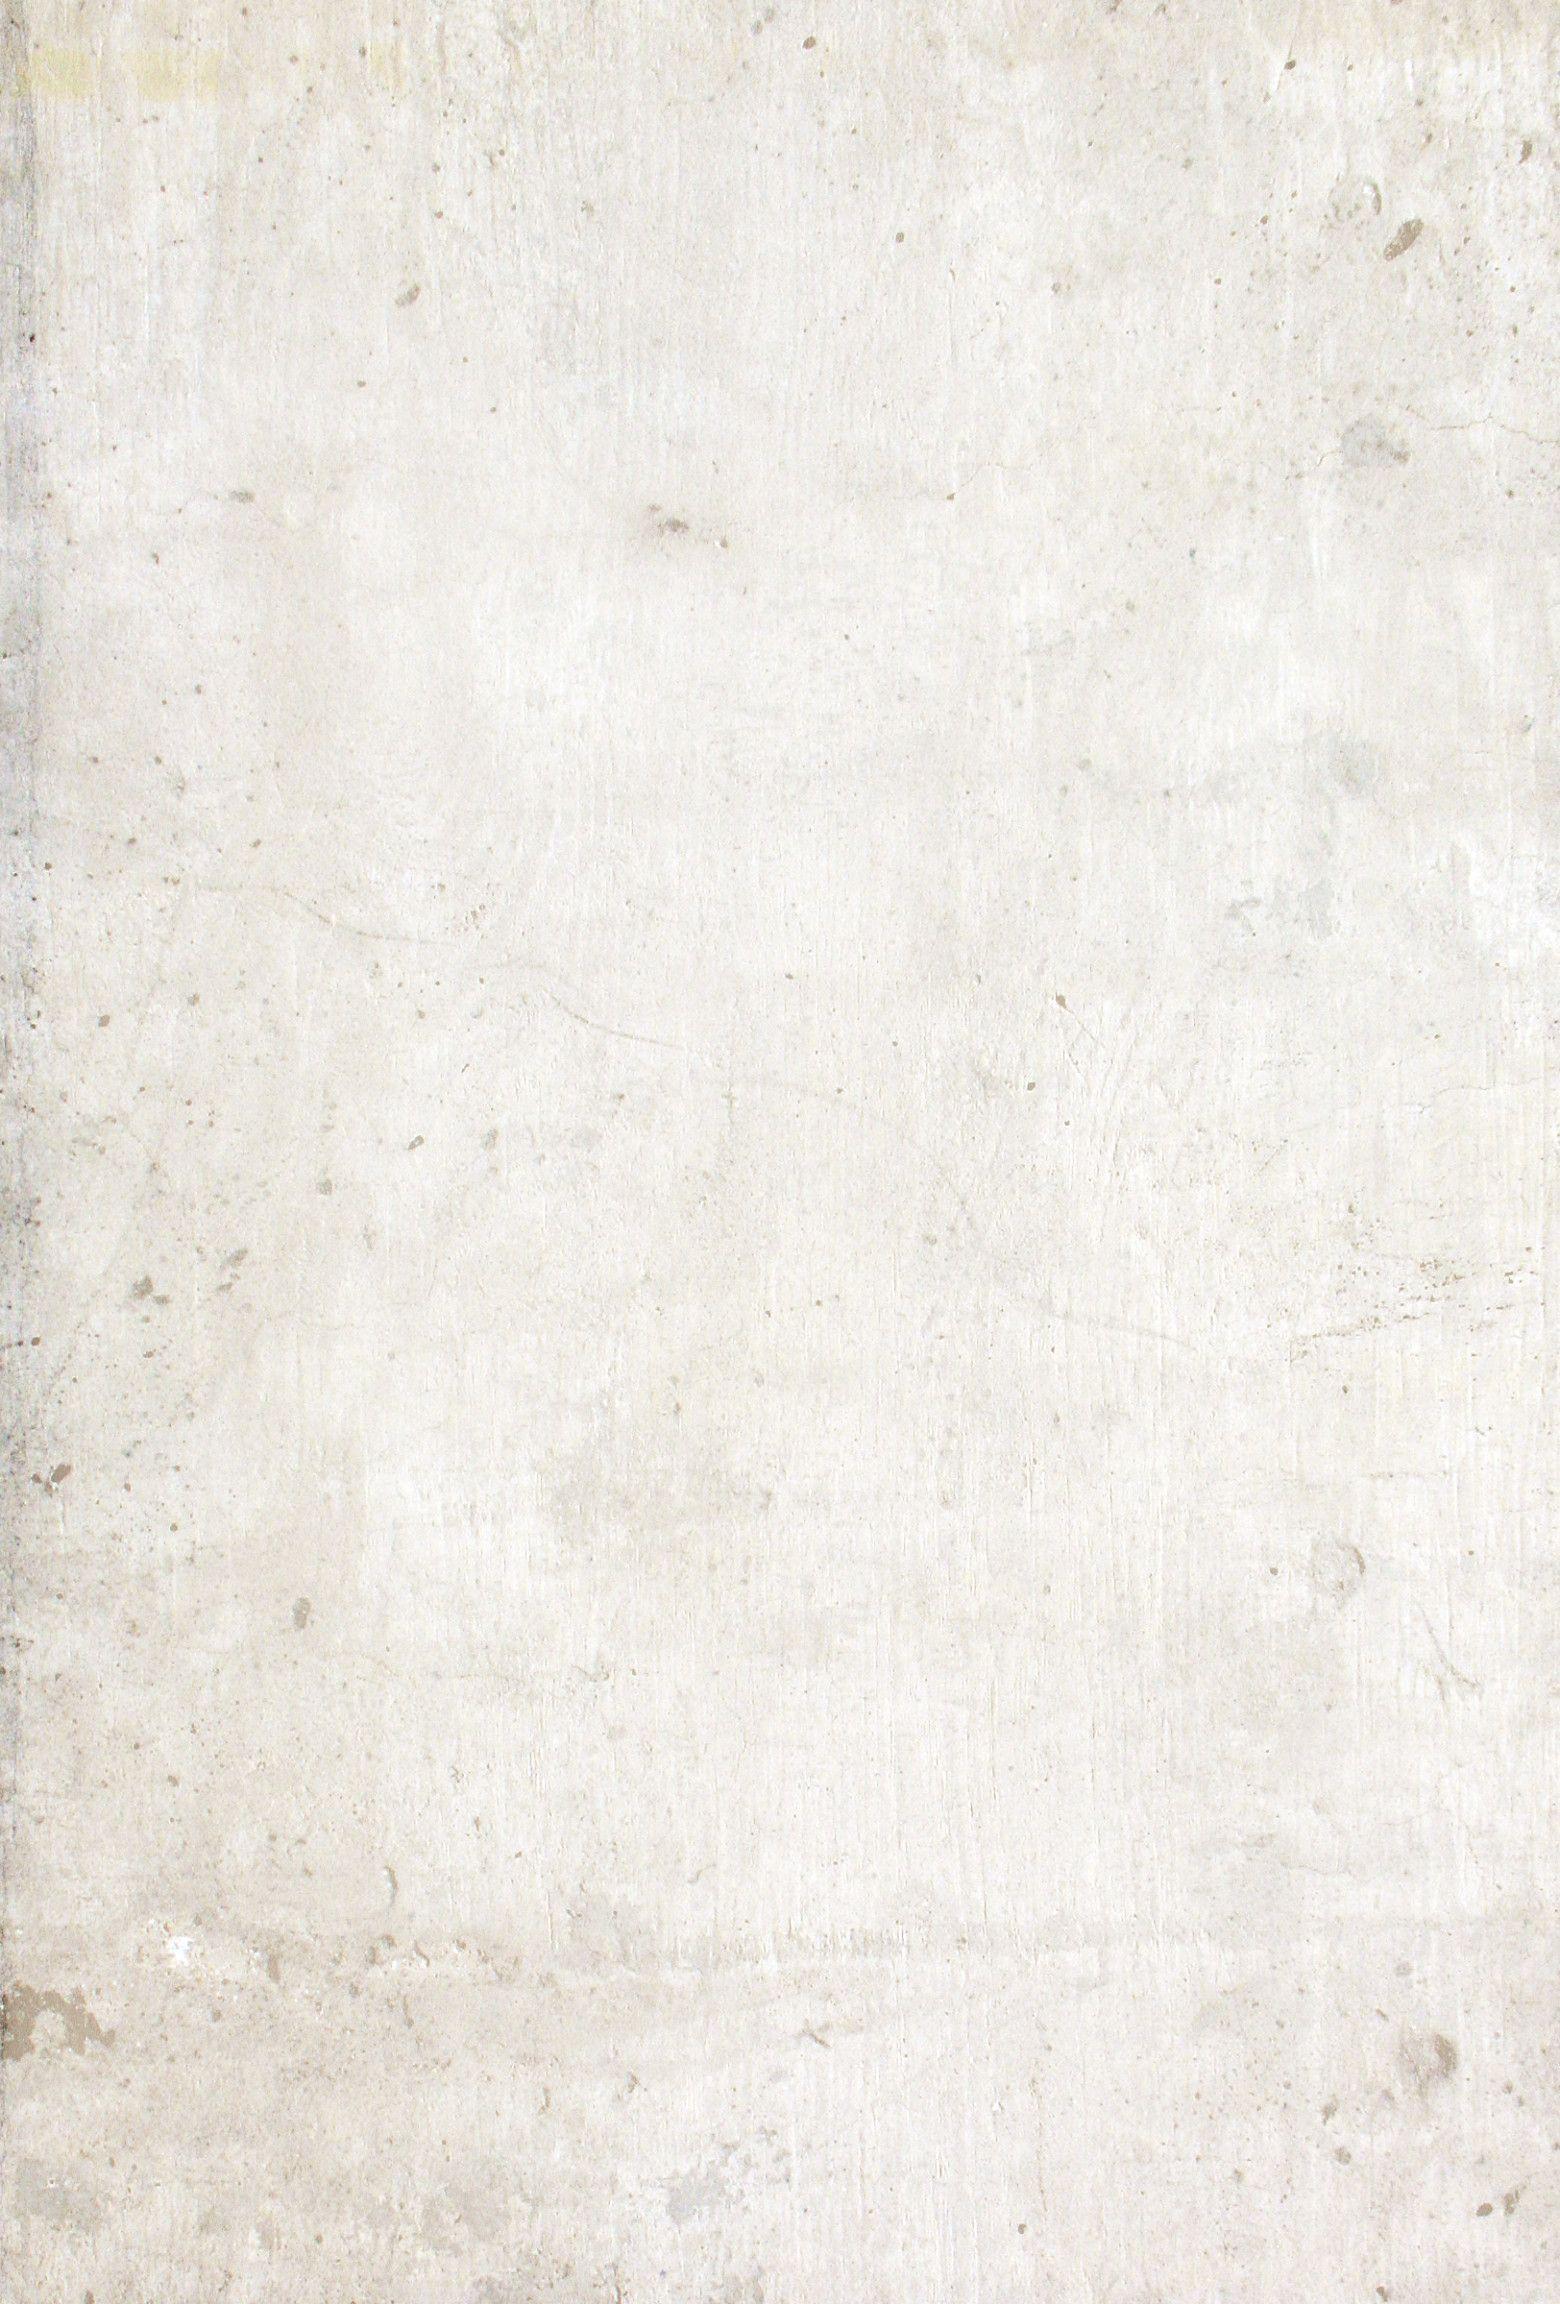 dirty-white-grunge-texture-6   texuture   Pinterest